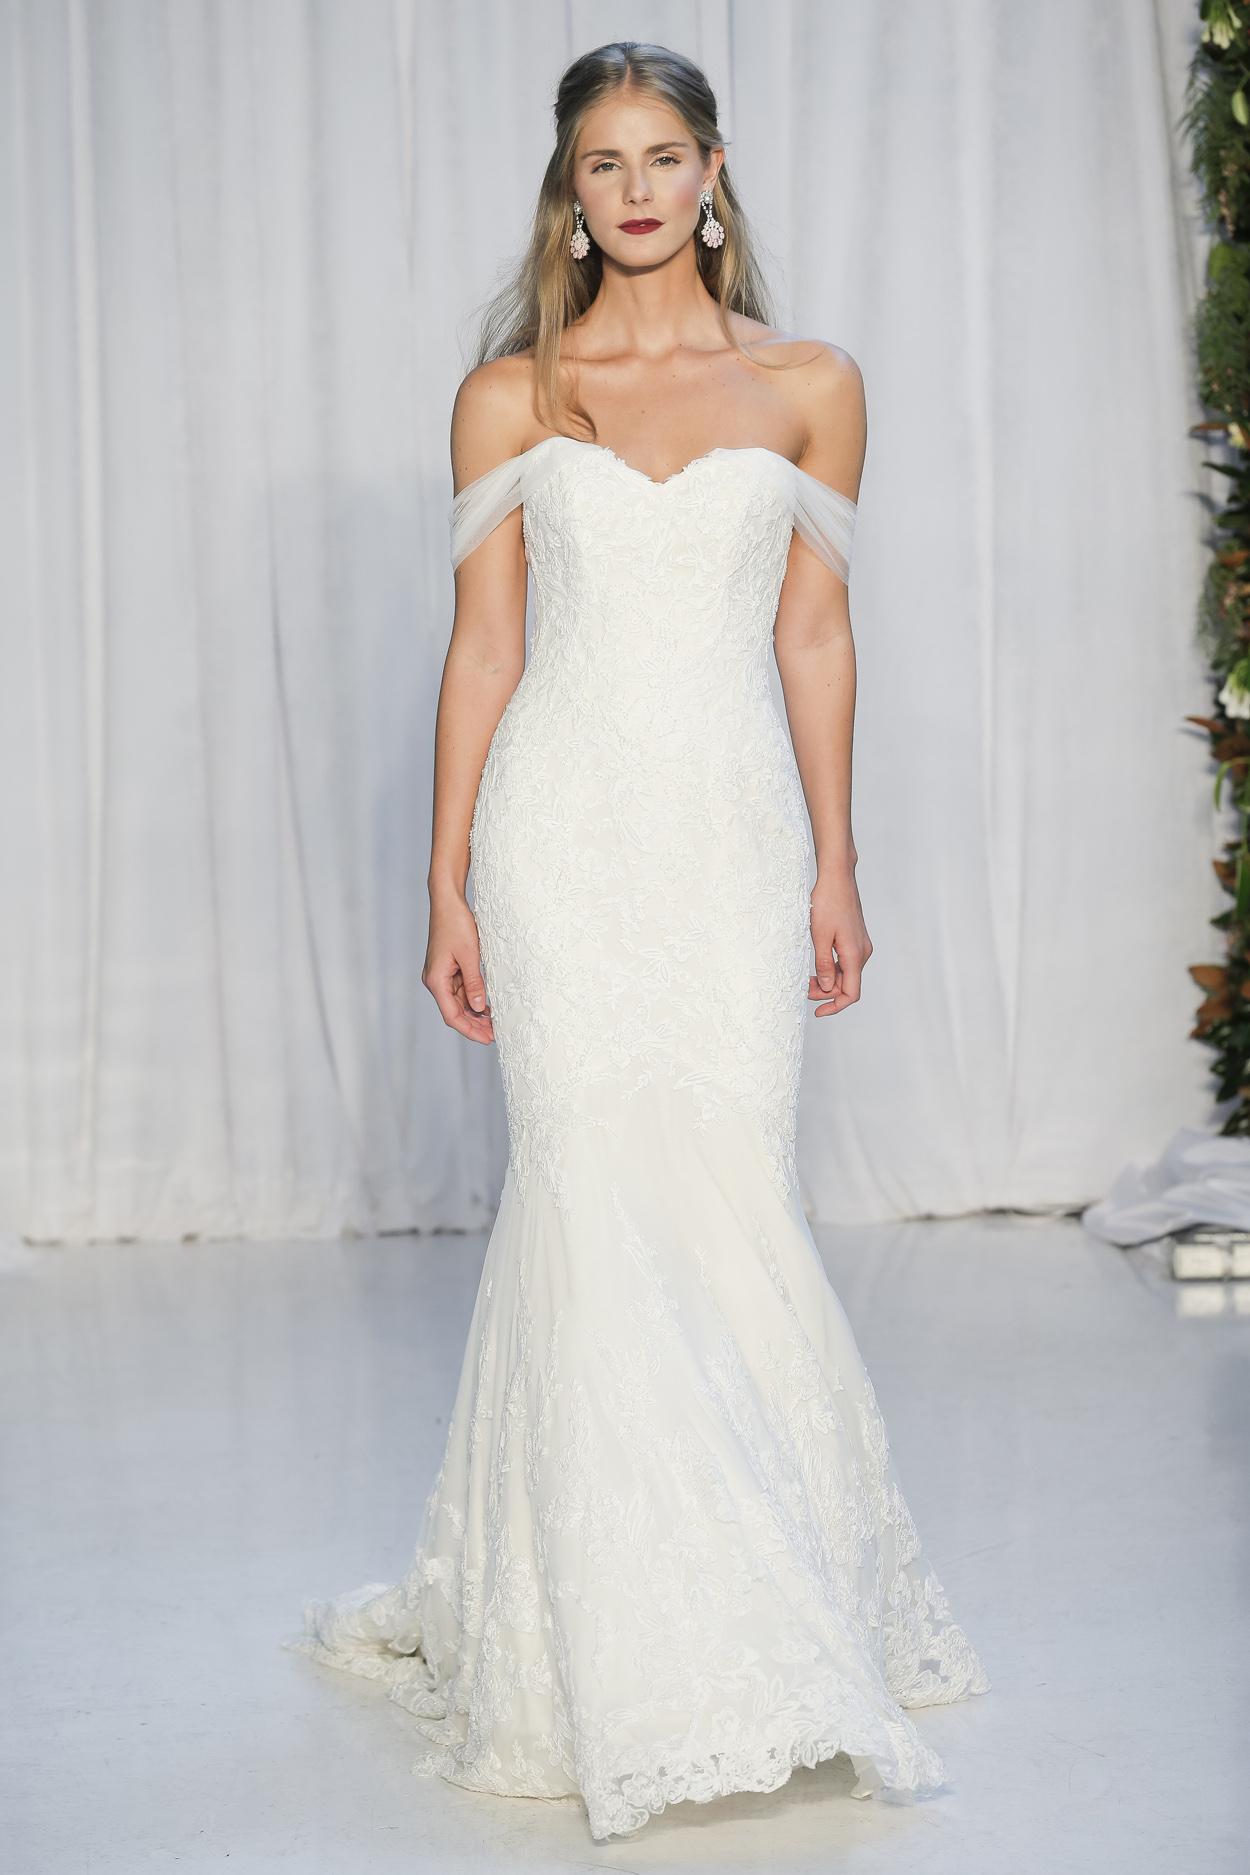 Raven sweetheart neckline wedding dress with off the shoulder straps Anne Barge